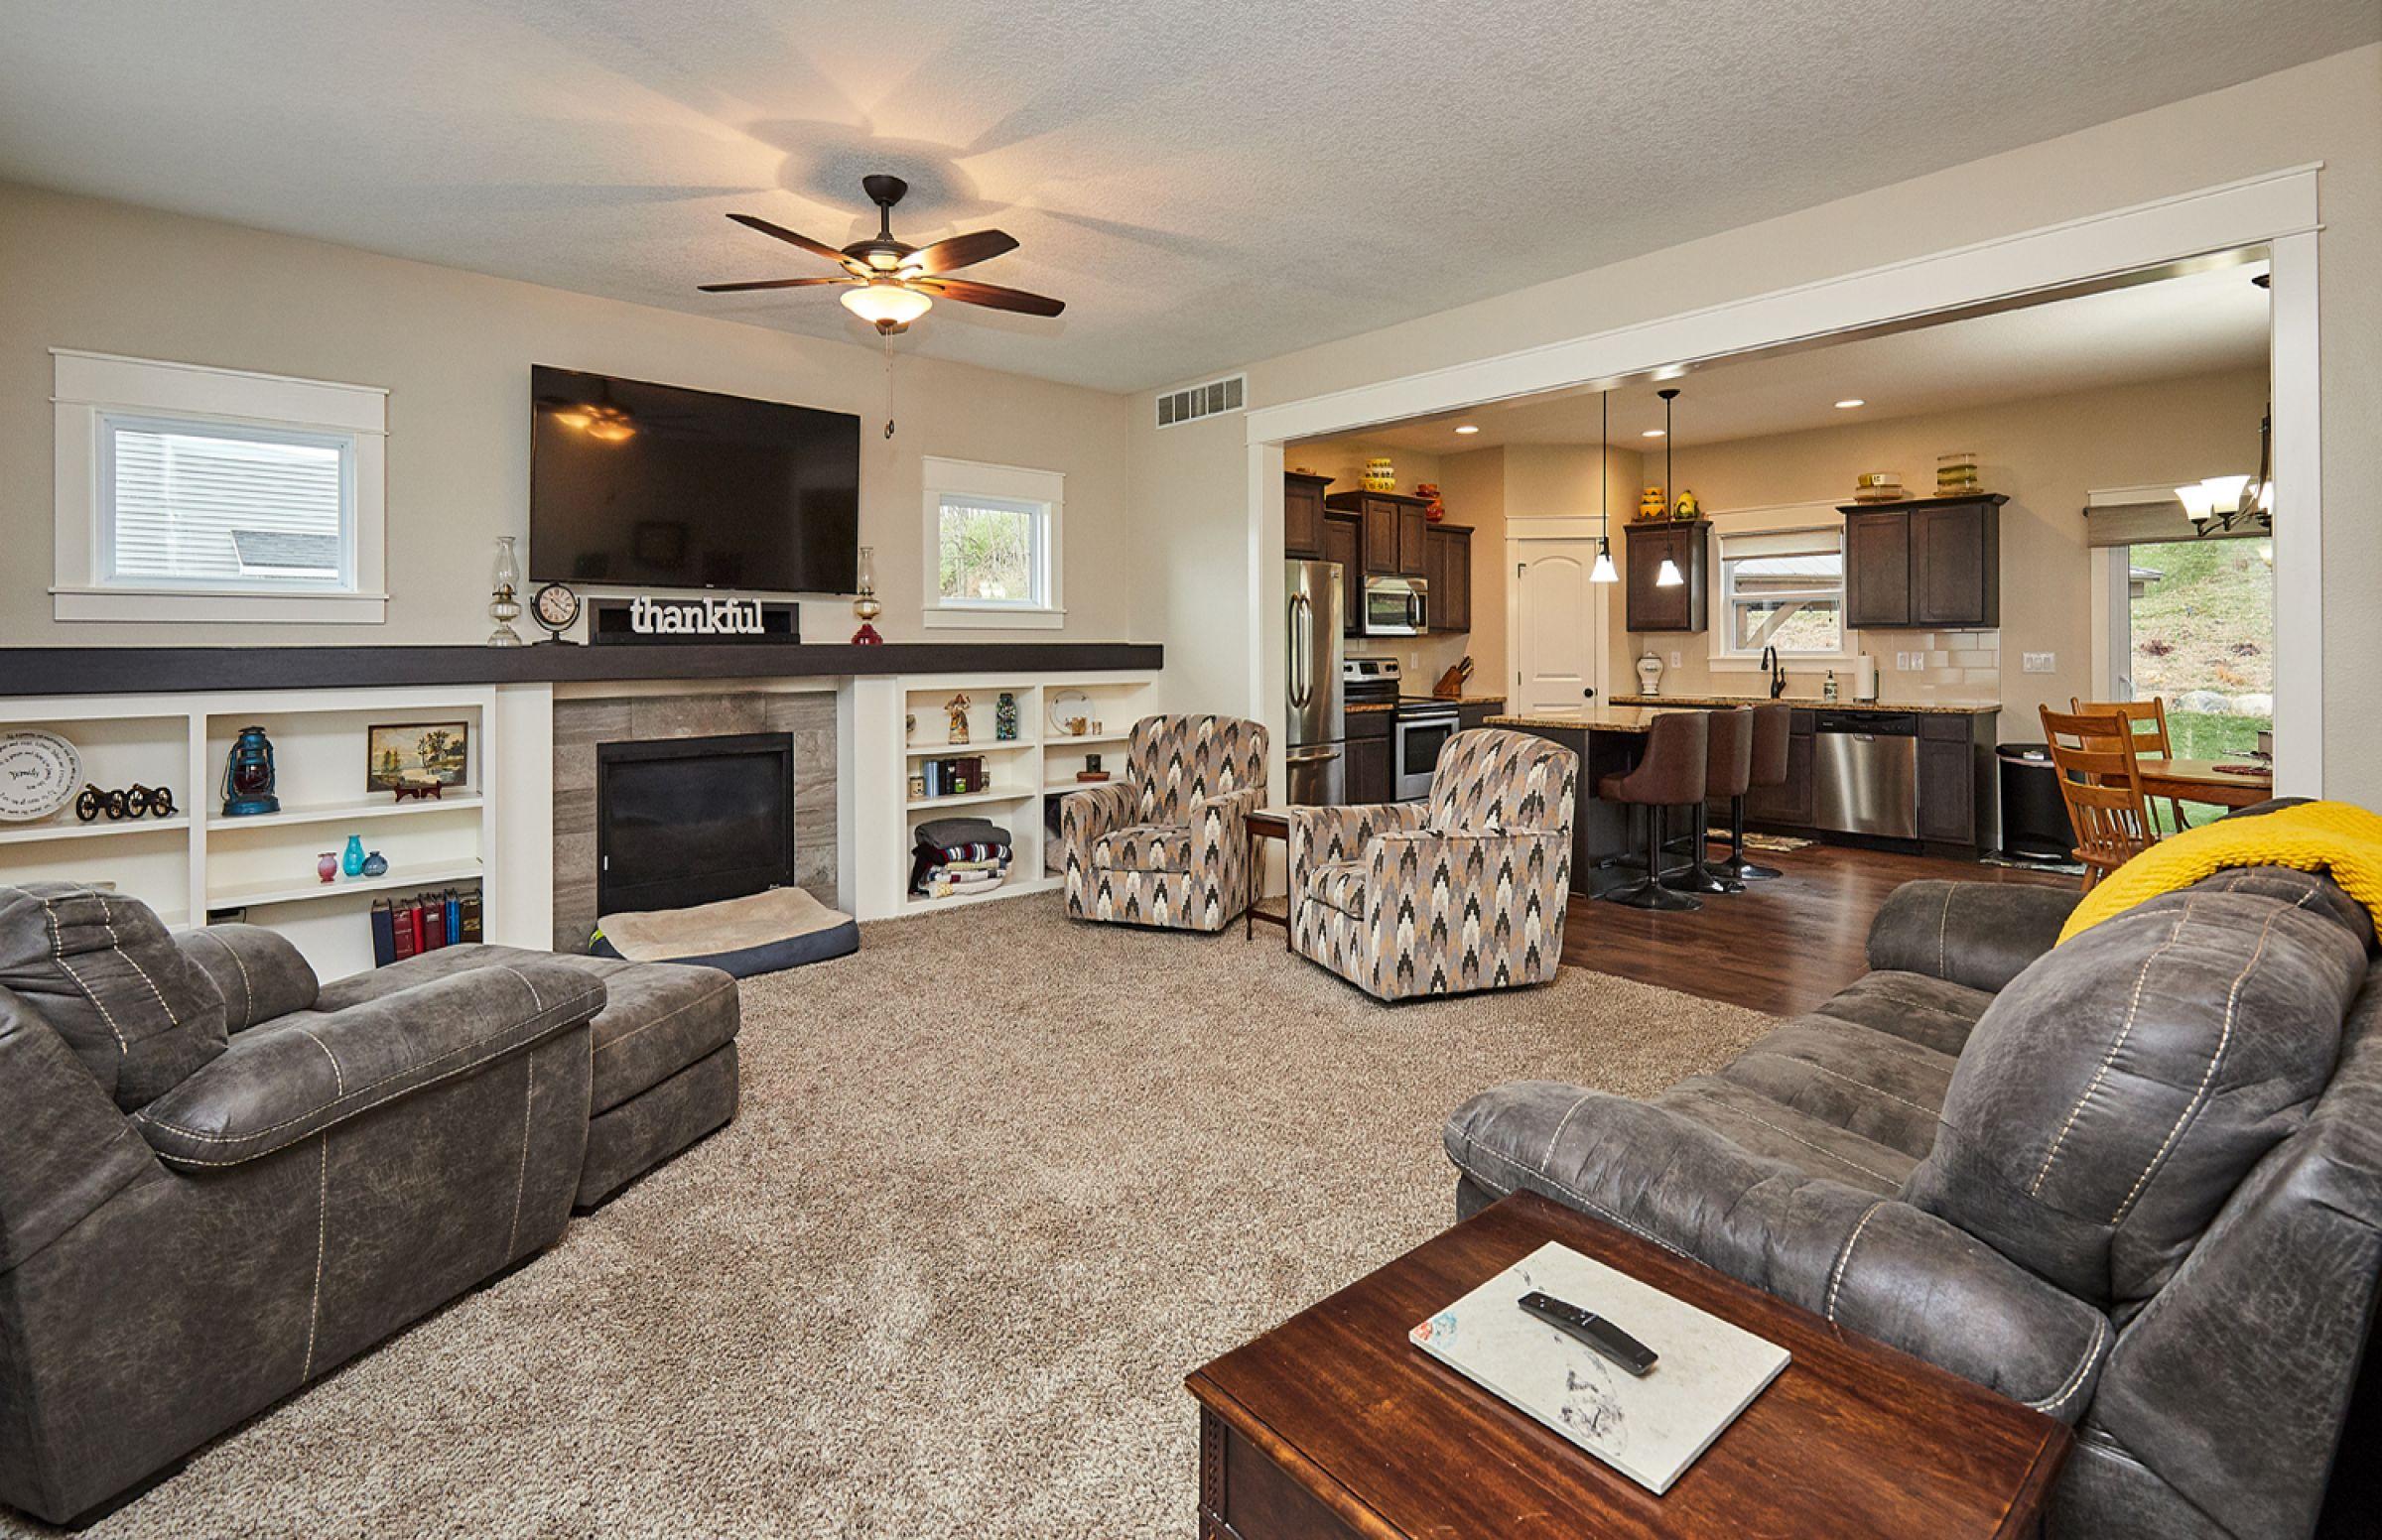 residential-warren-county-iowa-1-acres-listing-number-15254-11-2020-11-11-165819.jpg